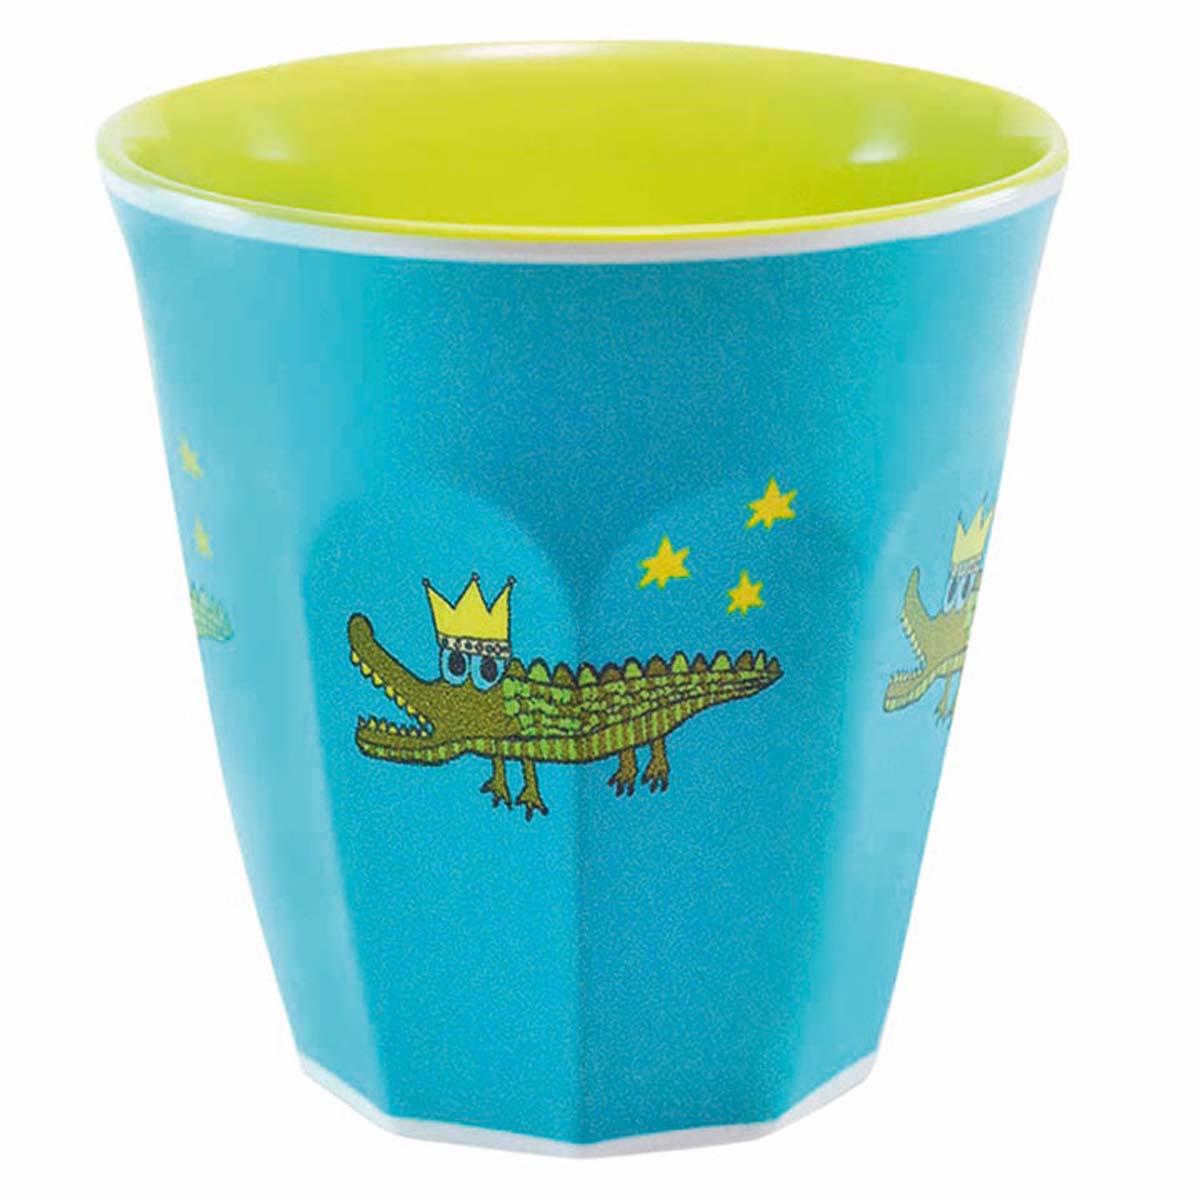 Gobelet mélamine \'Saperlipopette\' bleu vert (crocodile) - 75x75 cm - [R0622]